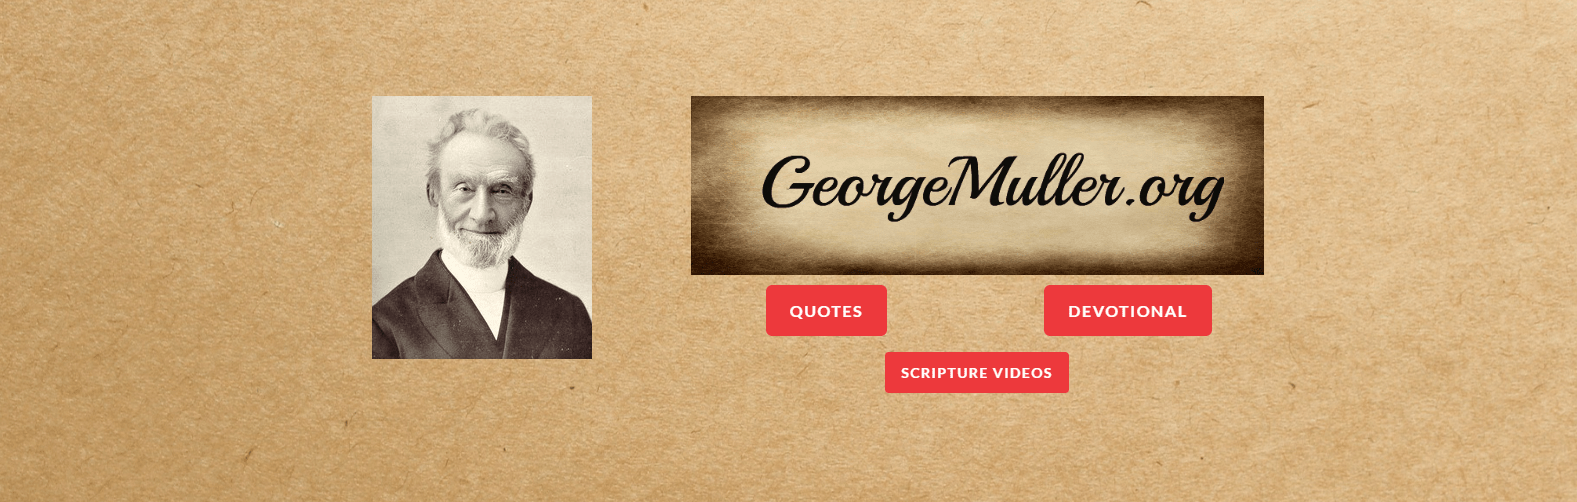 georgemuller.org